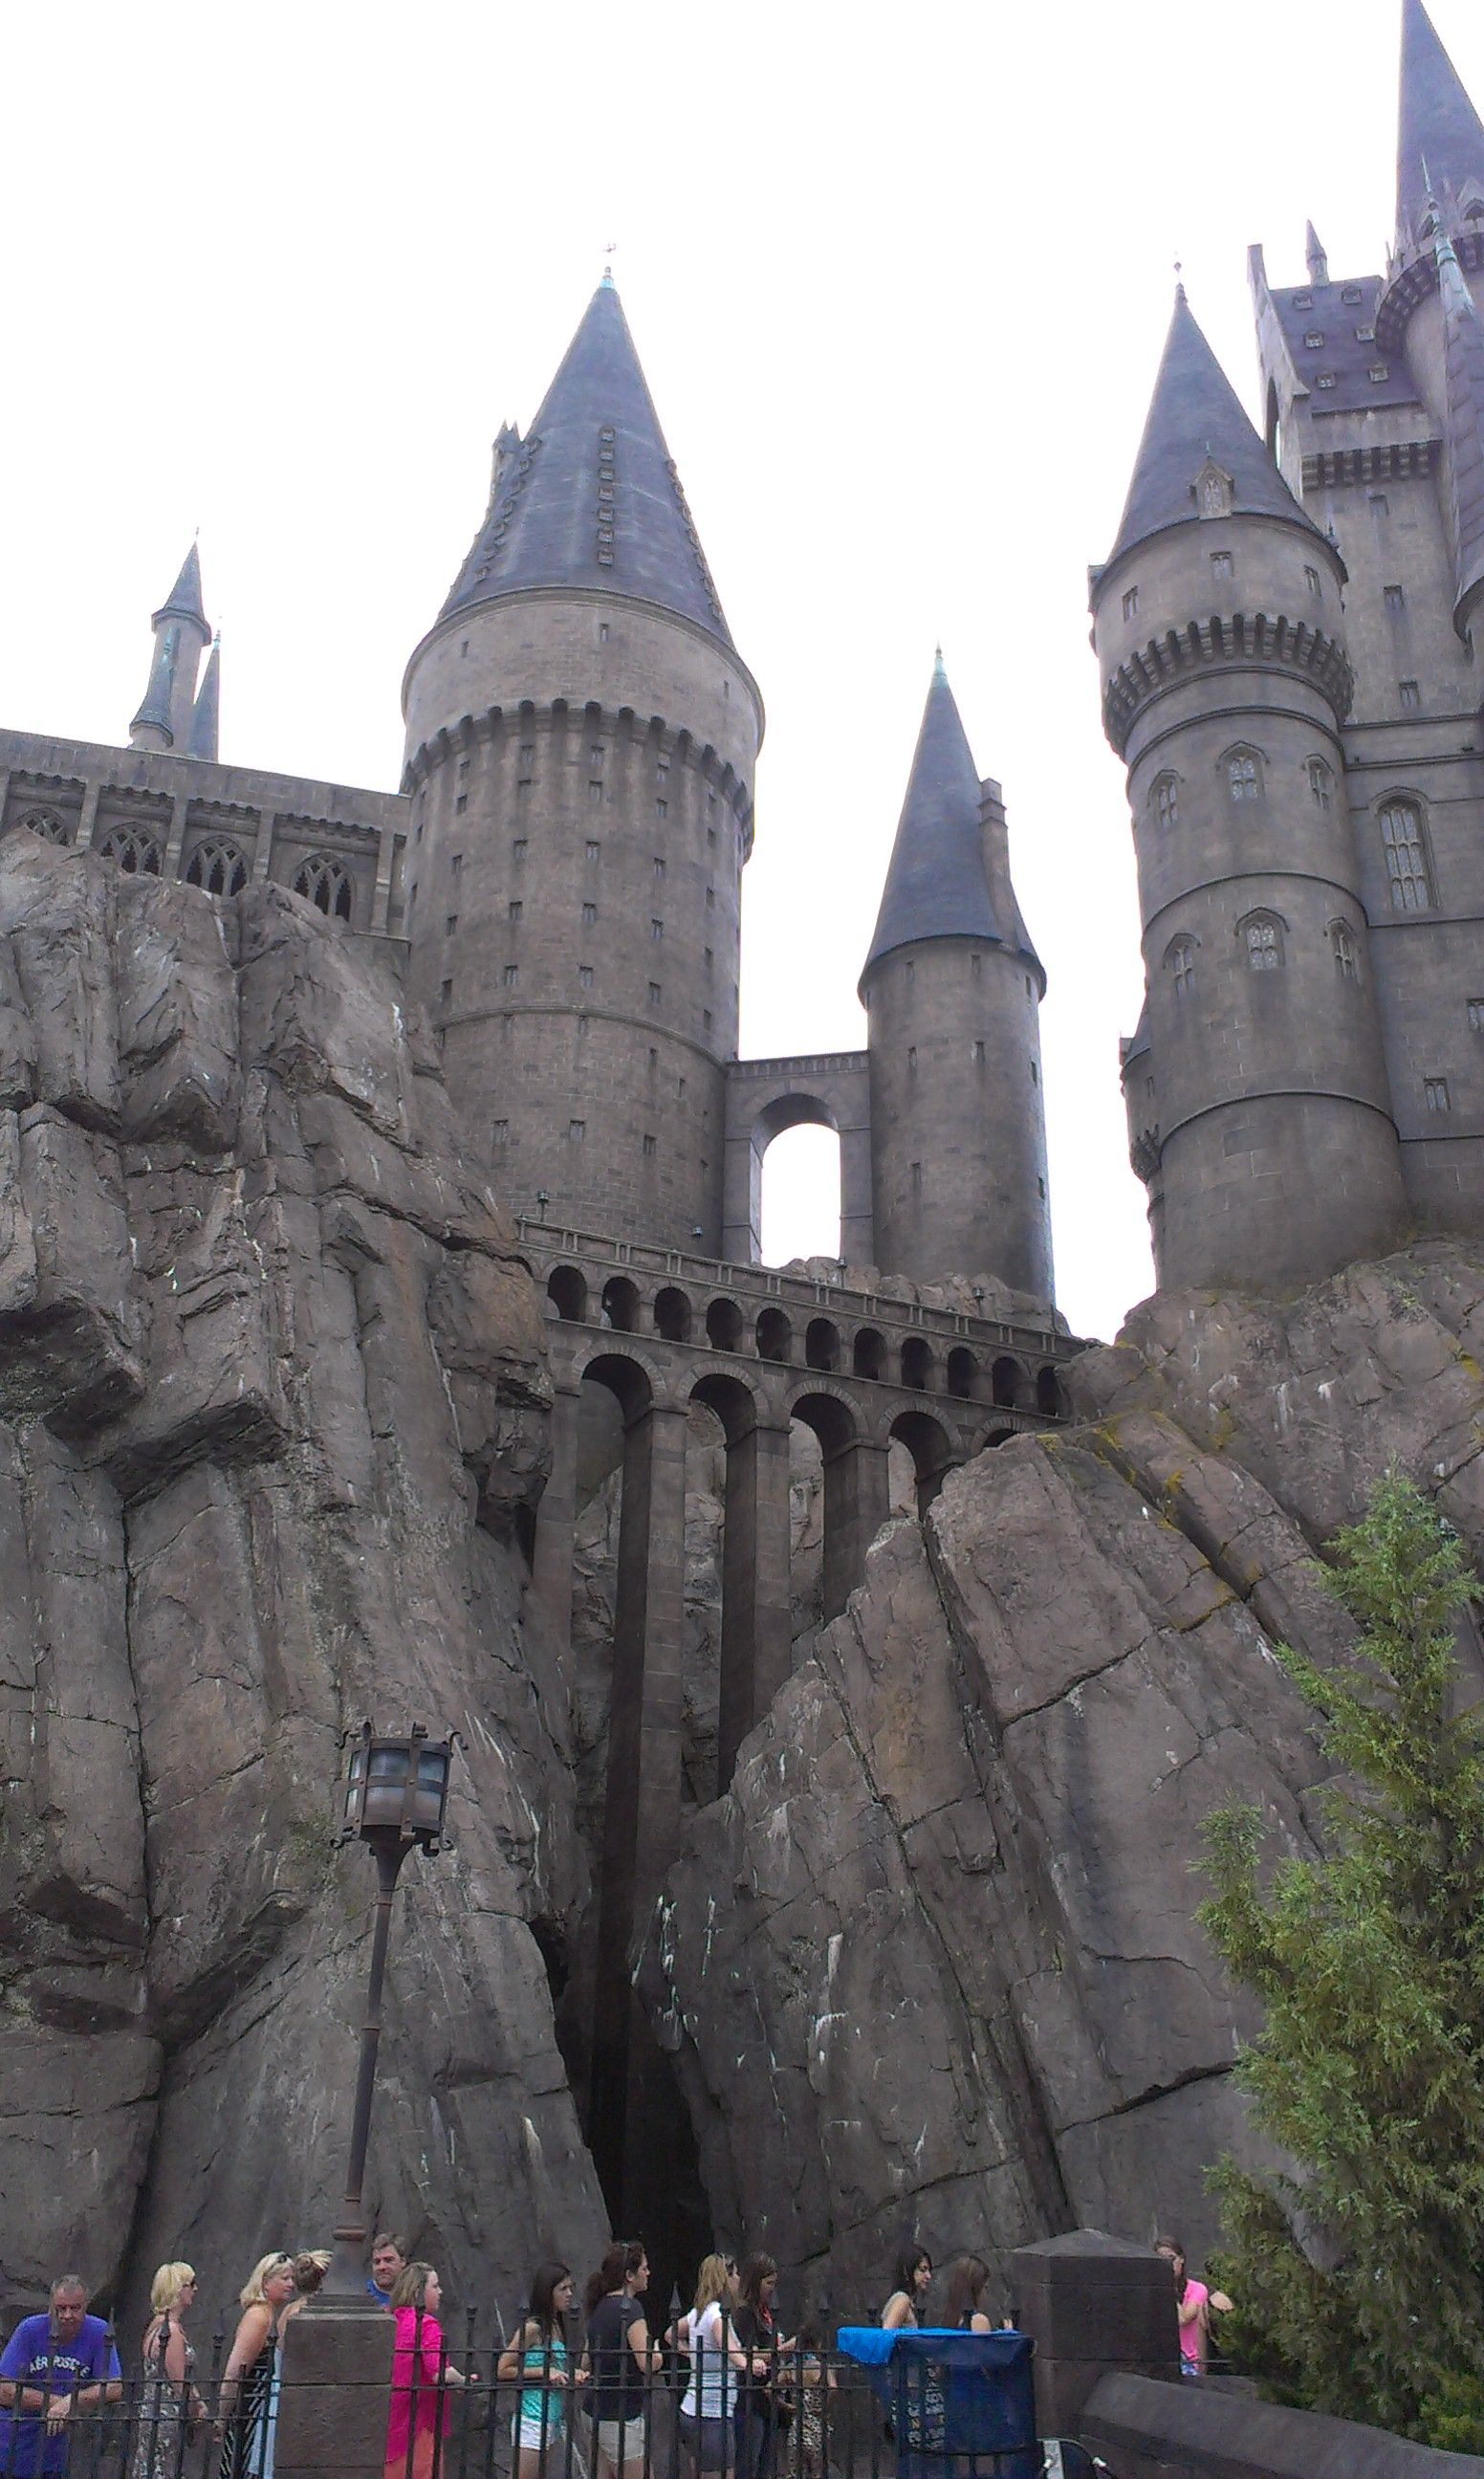 Universal Studios Orlando And Harry Potter World Www Flyeattrav Harry Potter Universal Studios Universal Studios Orlando Harry Potter Universal Studios Orlando